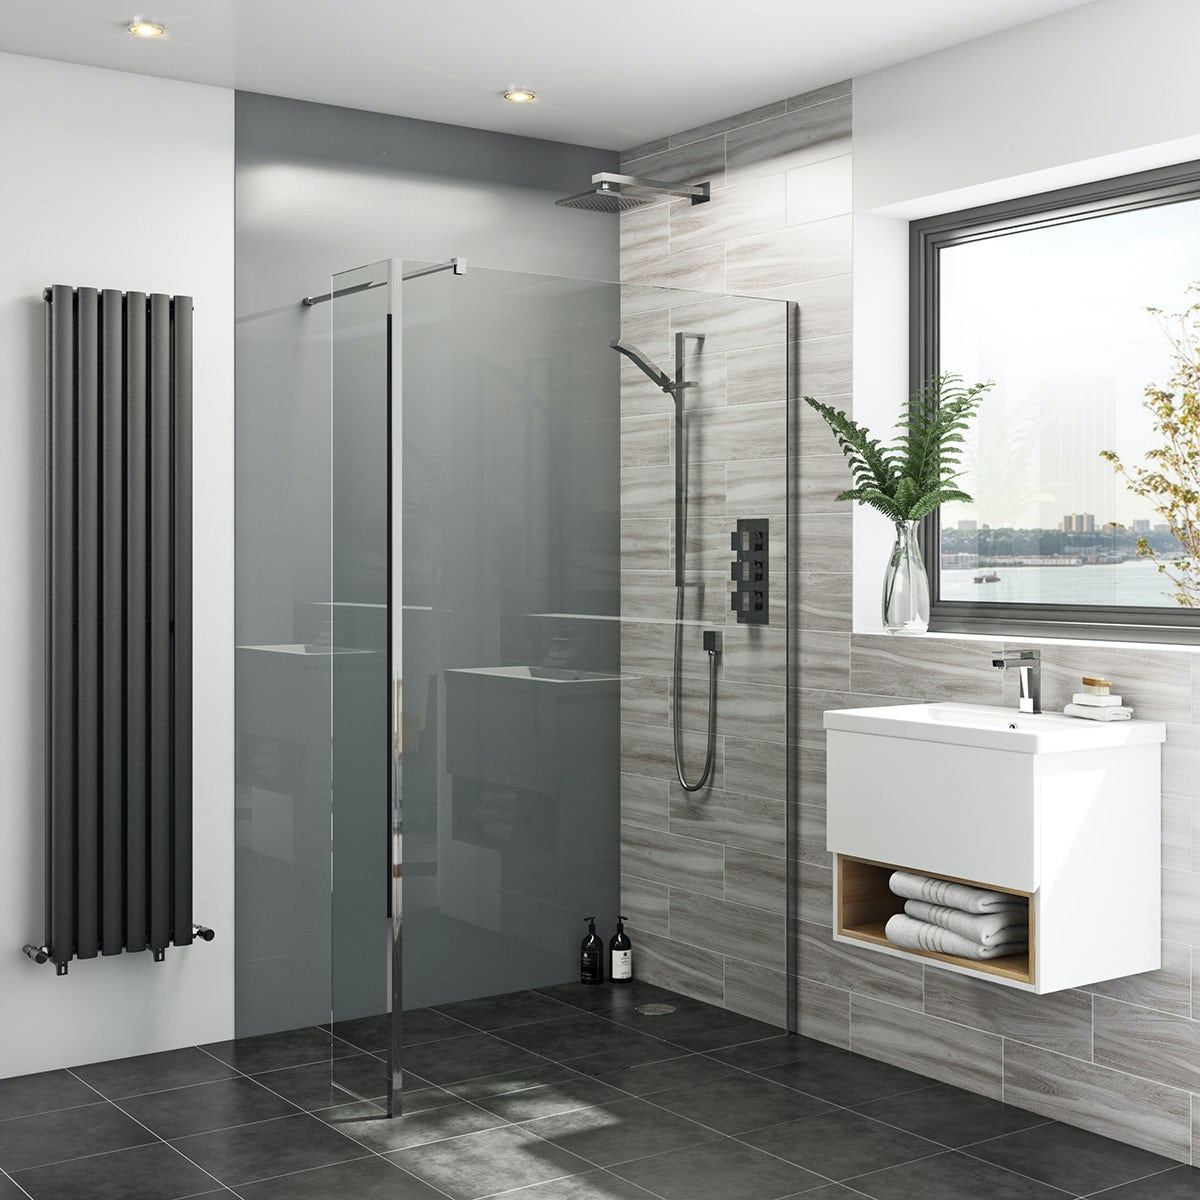 Bathroom Wall Board : Zenolite plus ash acrylic shower wall panel